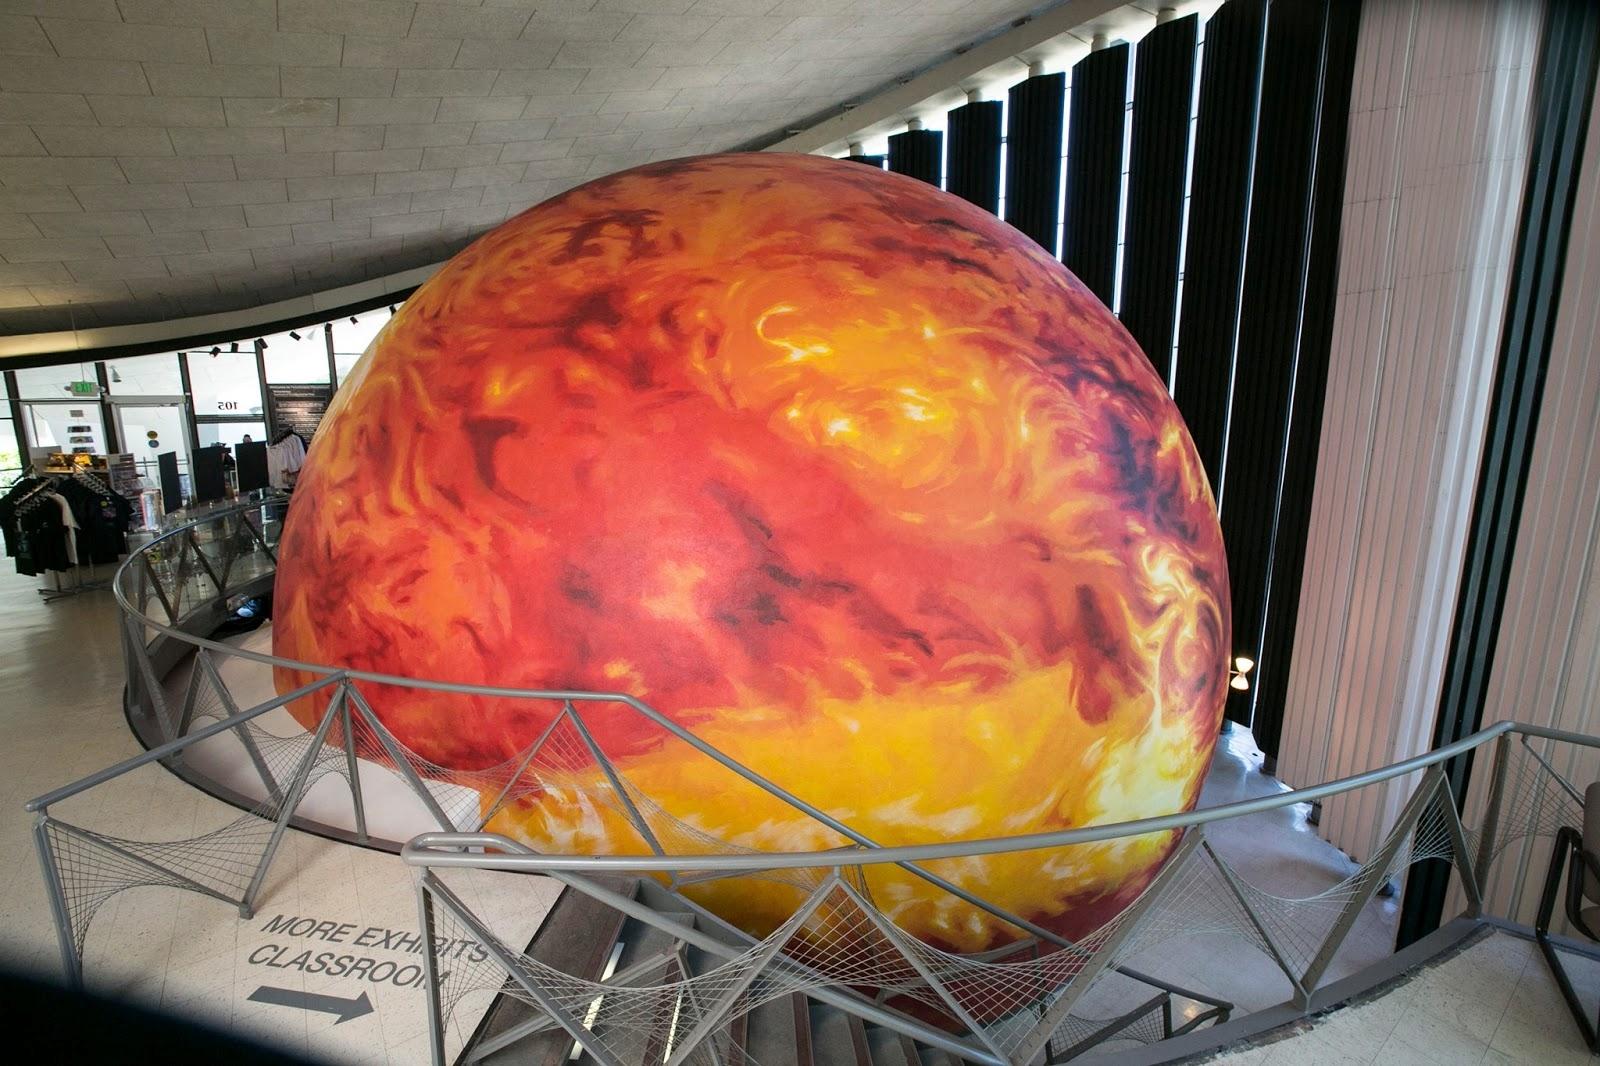 Muralist Erik Burke painted this large dome to look like the Sun. Credit: http://eriktburke.com/Planetarium